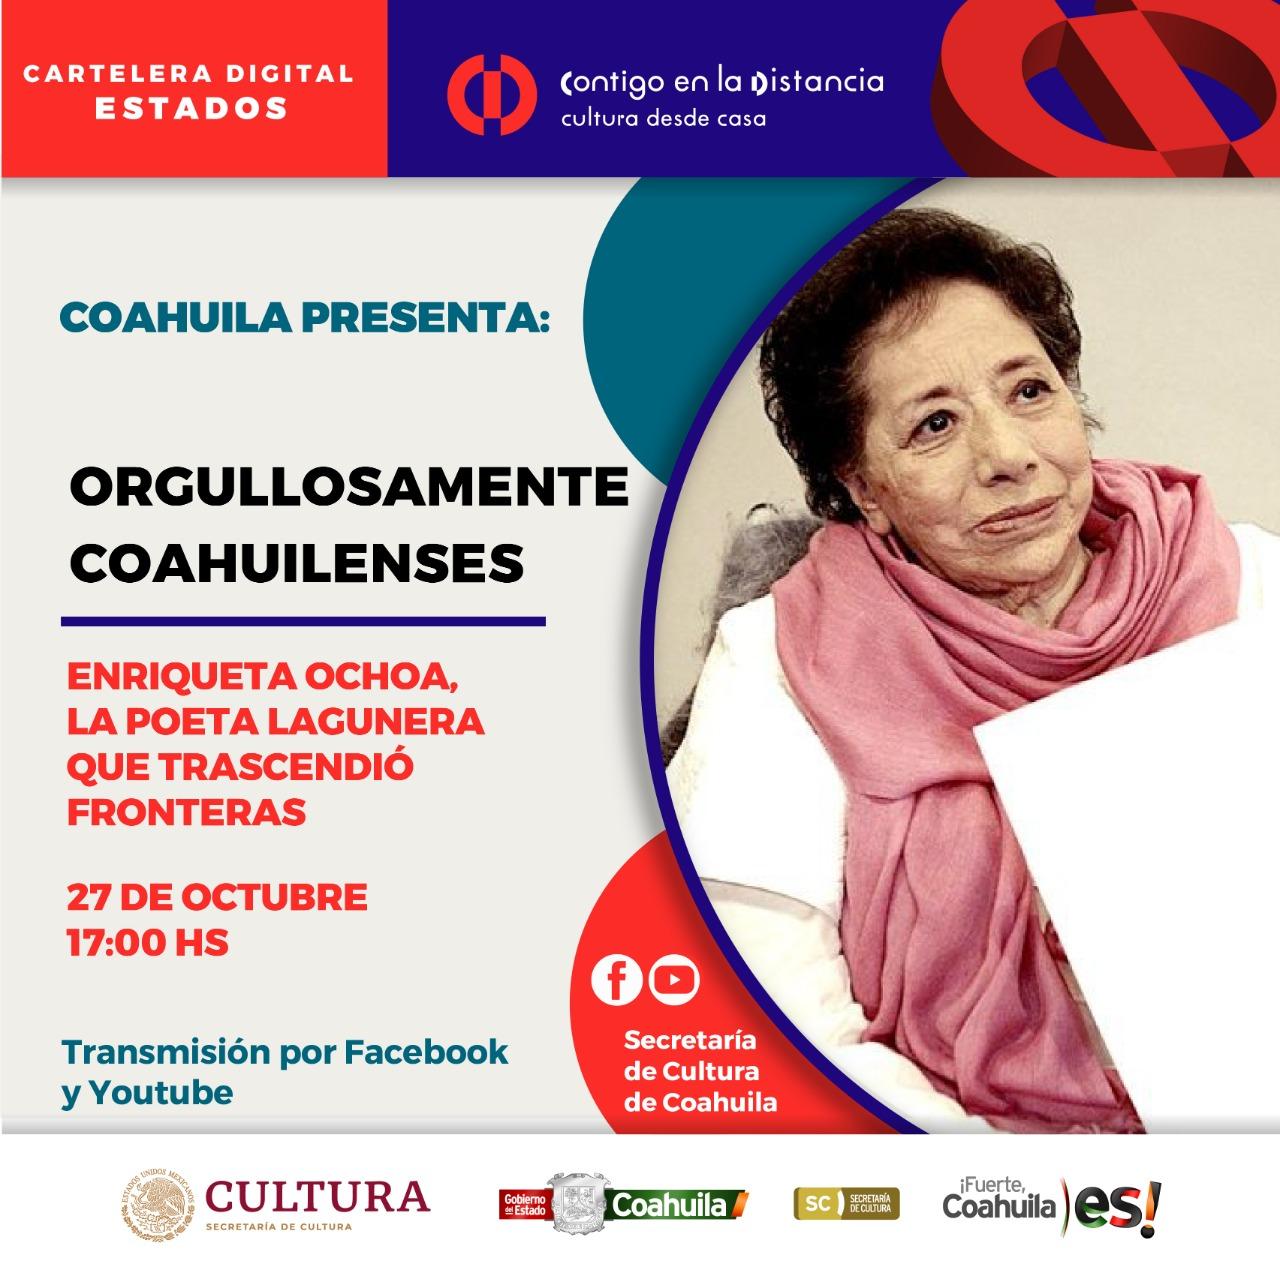 COAHUILA PRESENTA: ORGULLOSAMENTE COAHUILENSES